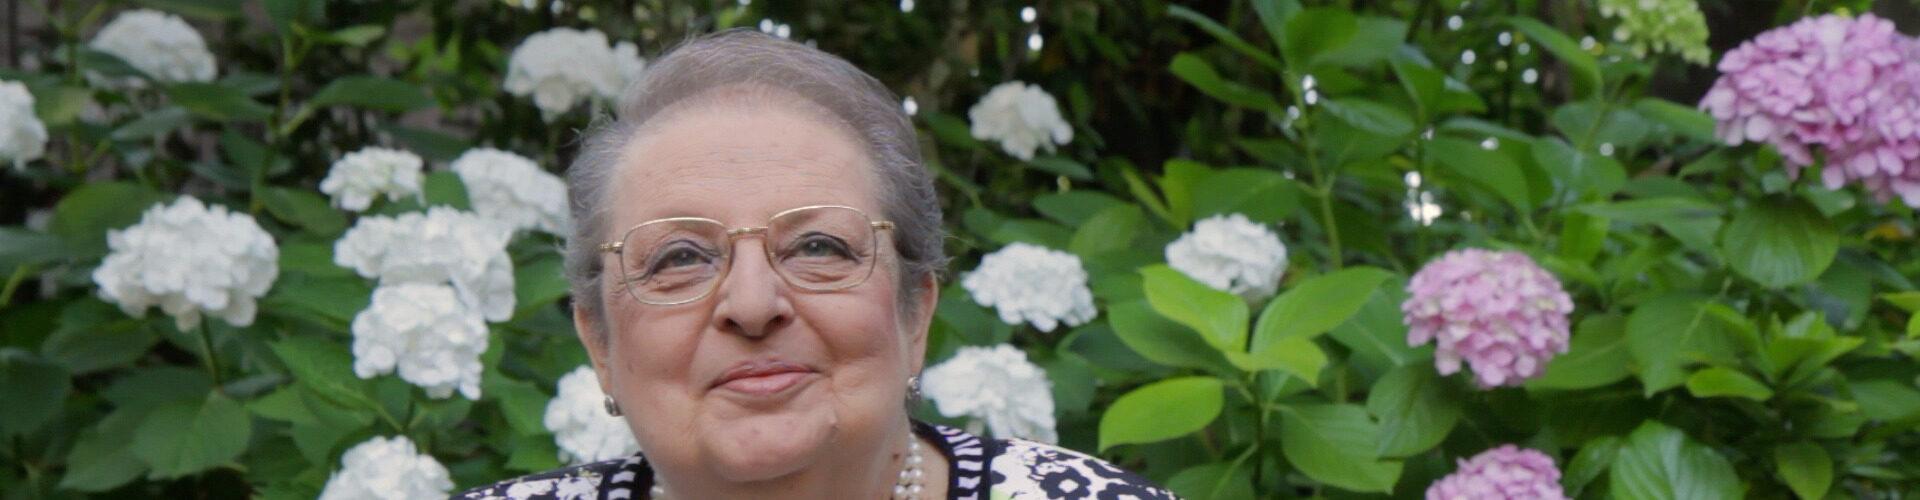 Addio a Rosanna Pettinelli